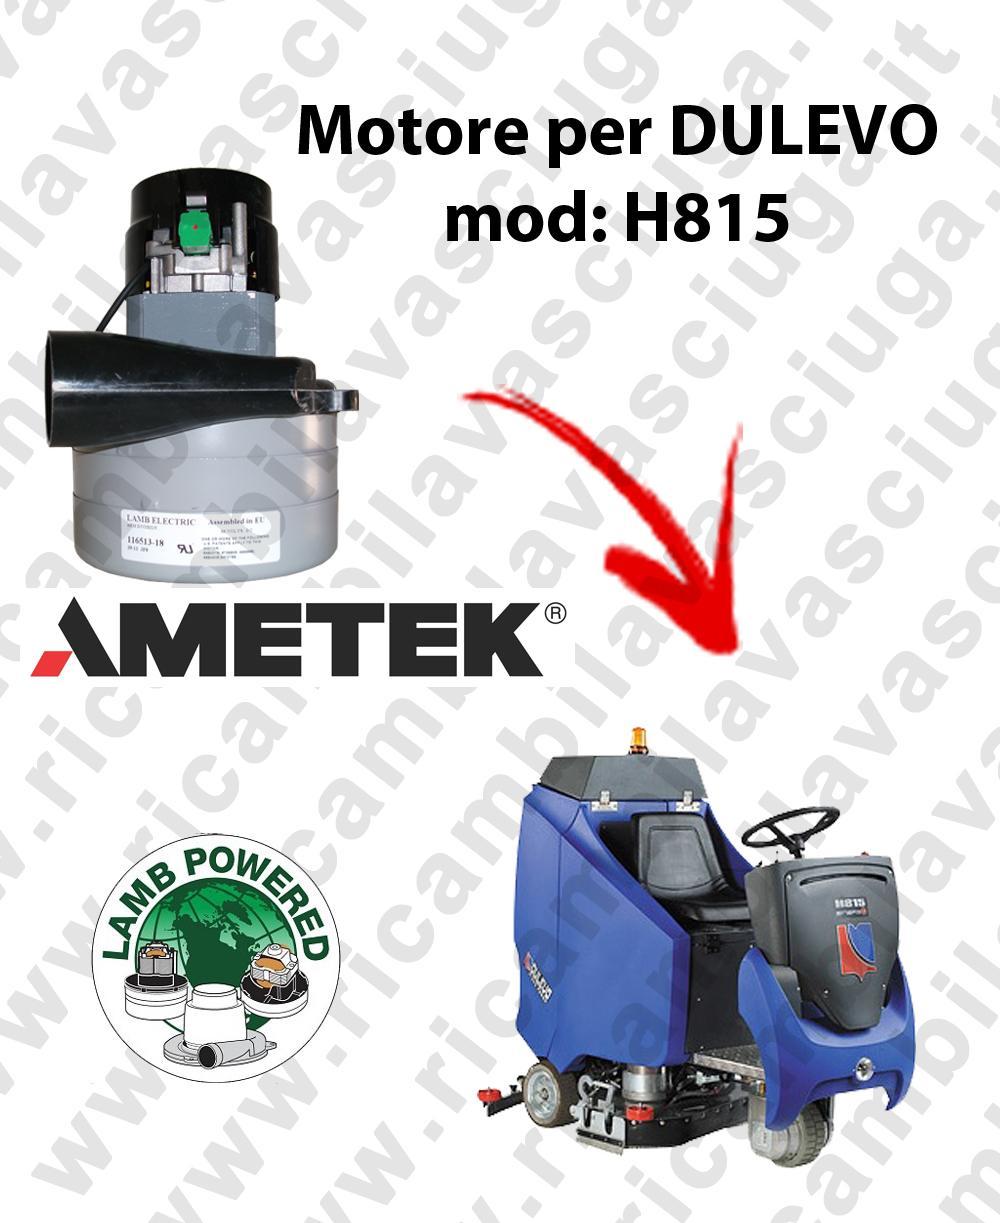 H815 Saugmotor LAMB AMETEK für scheuersaugmaschinen DULEVO